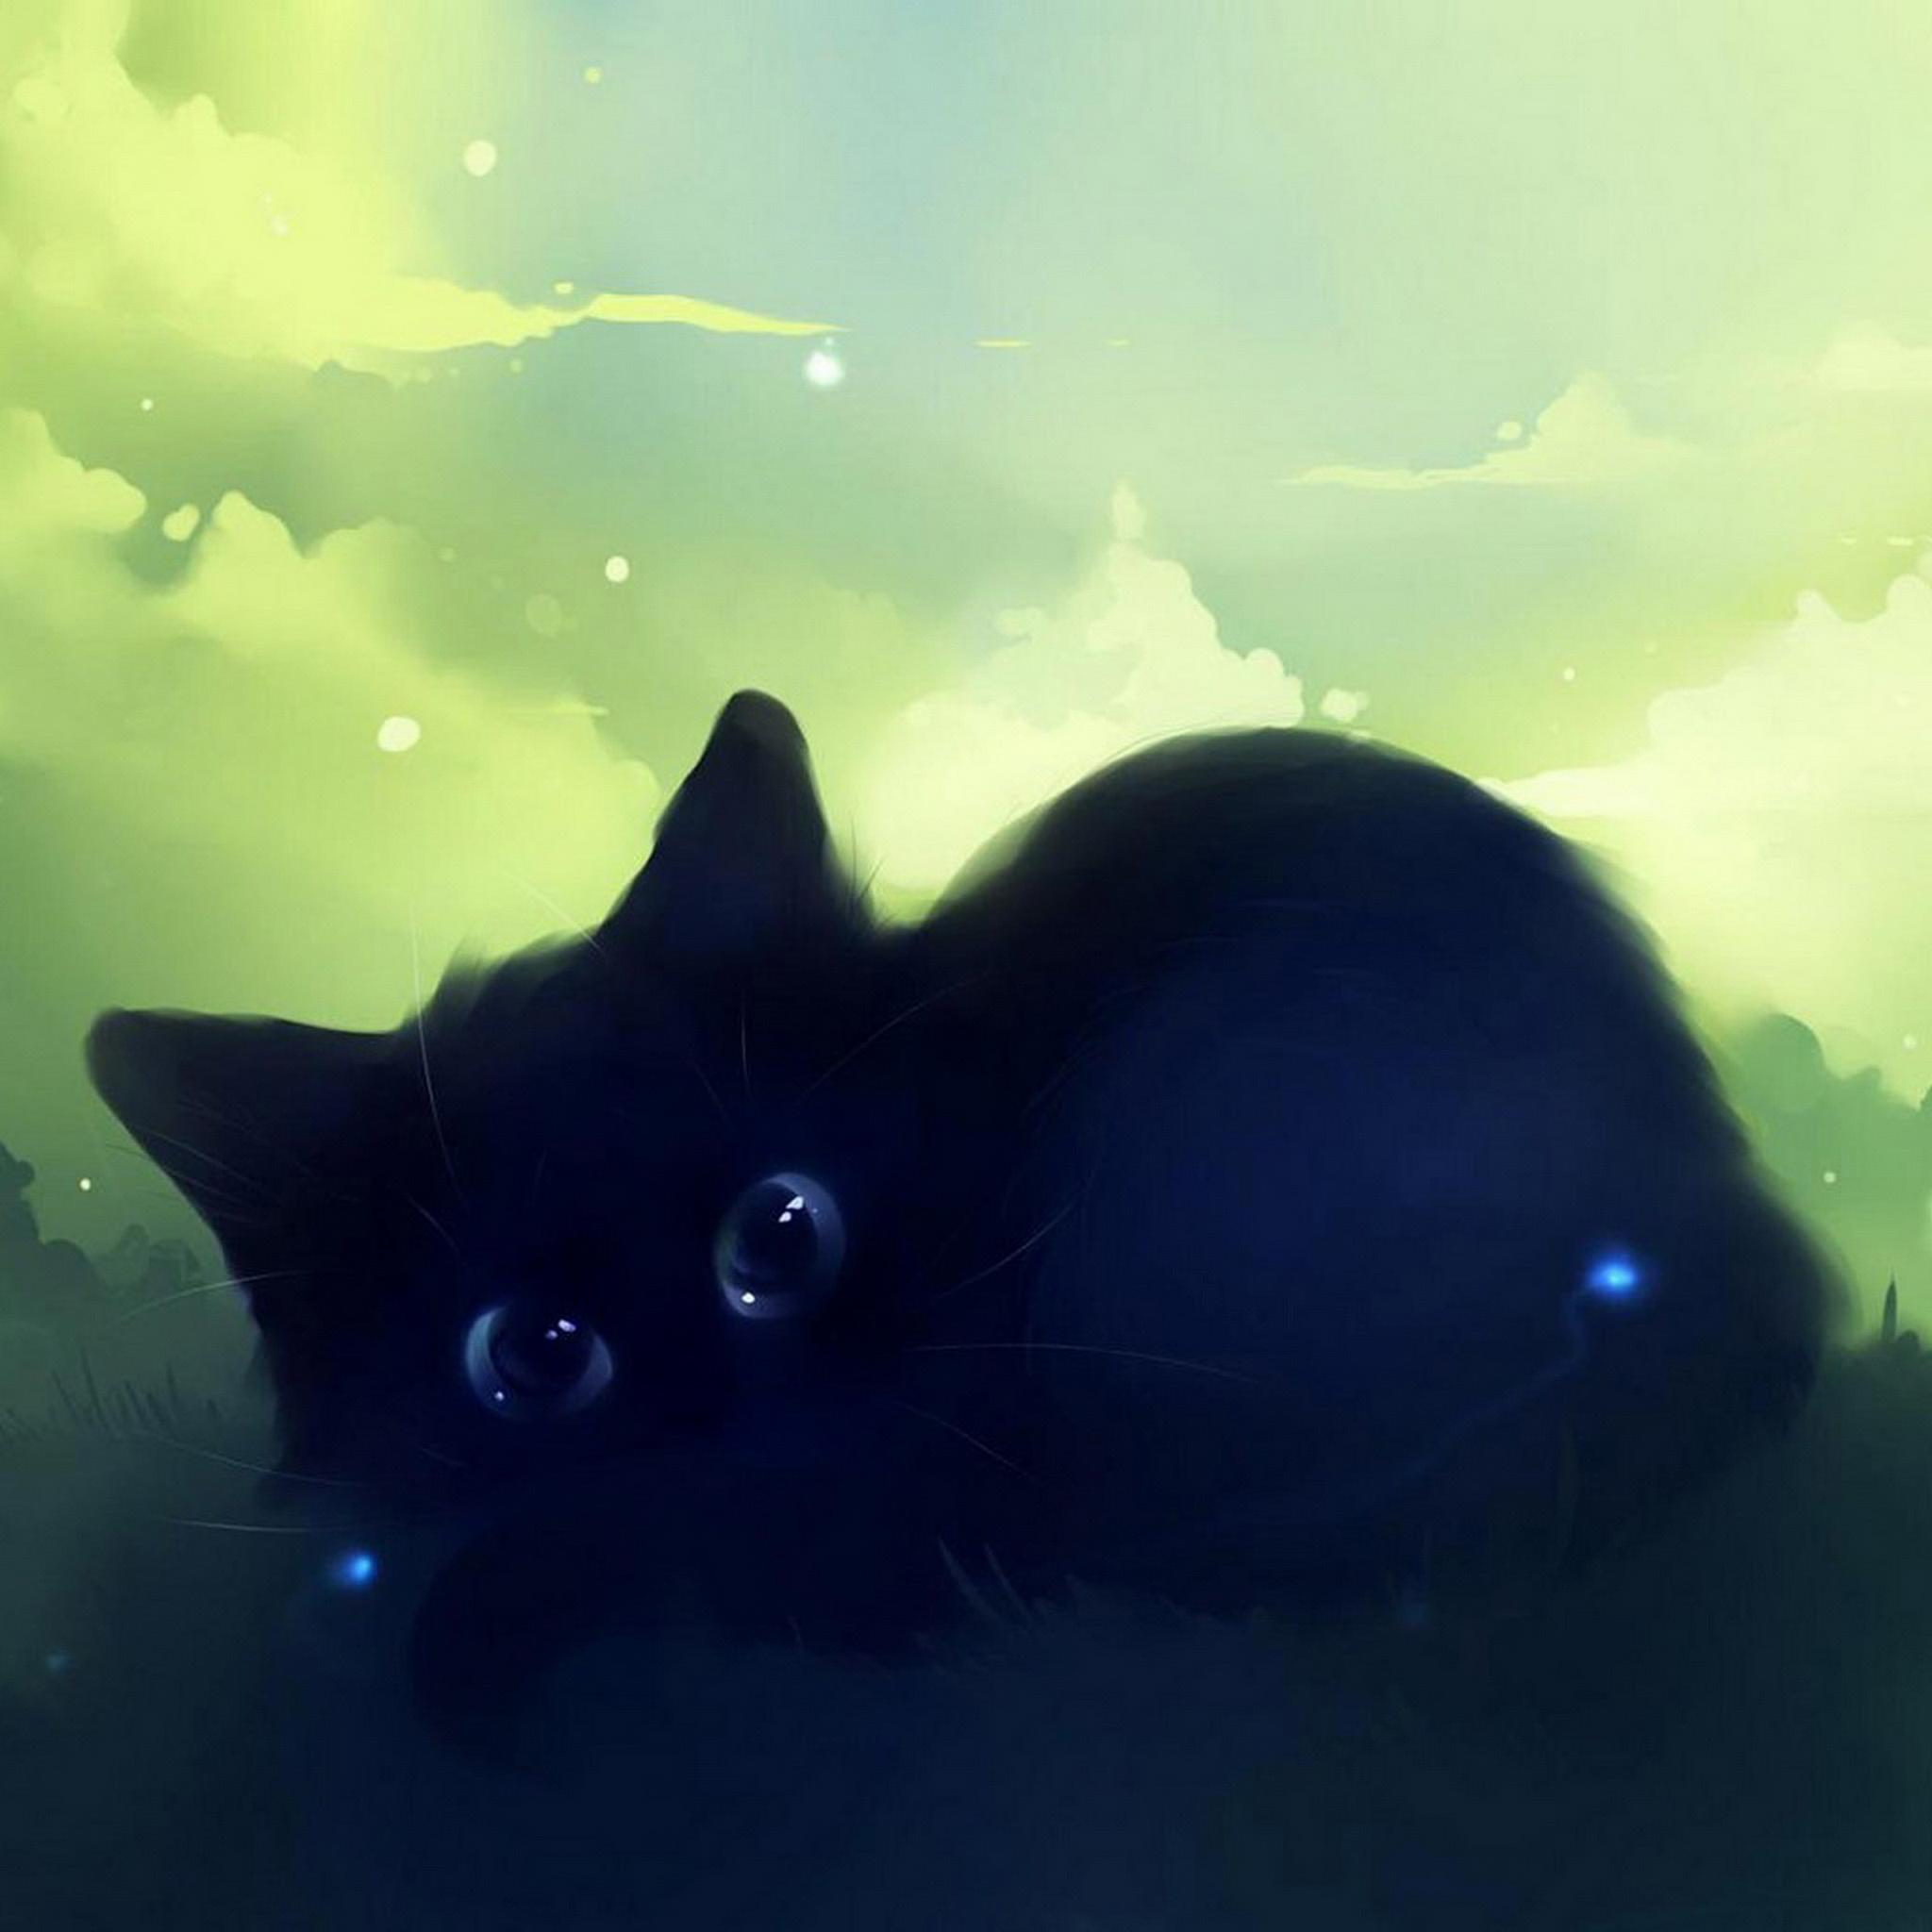 Eyes-Black-Cat-3Wallpapers-iPad-Retina